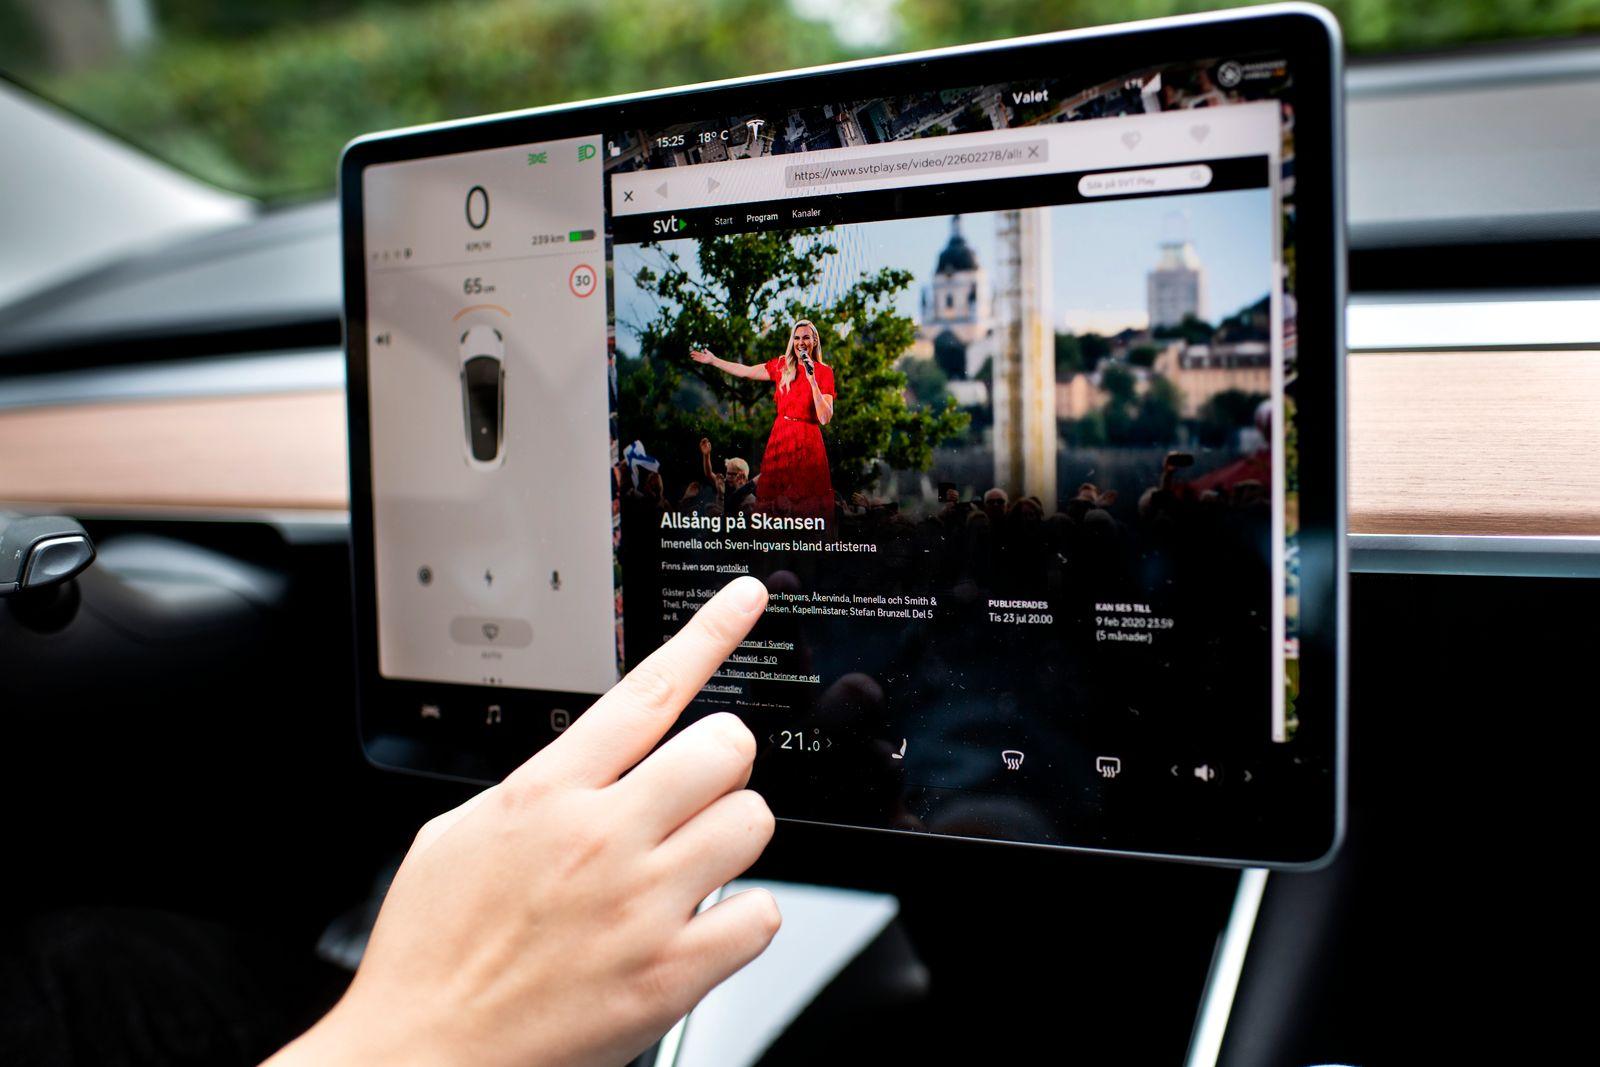 Tesla Model 3 Long Range vehicle communication road street transport dashboard screen computor display controls touchscr